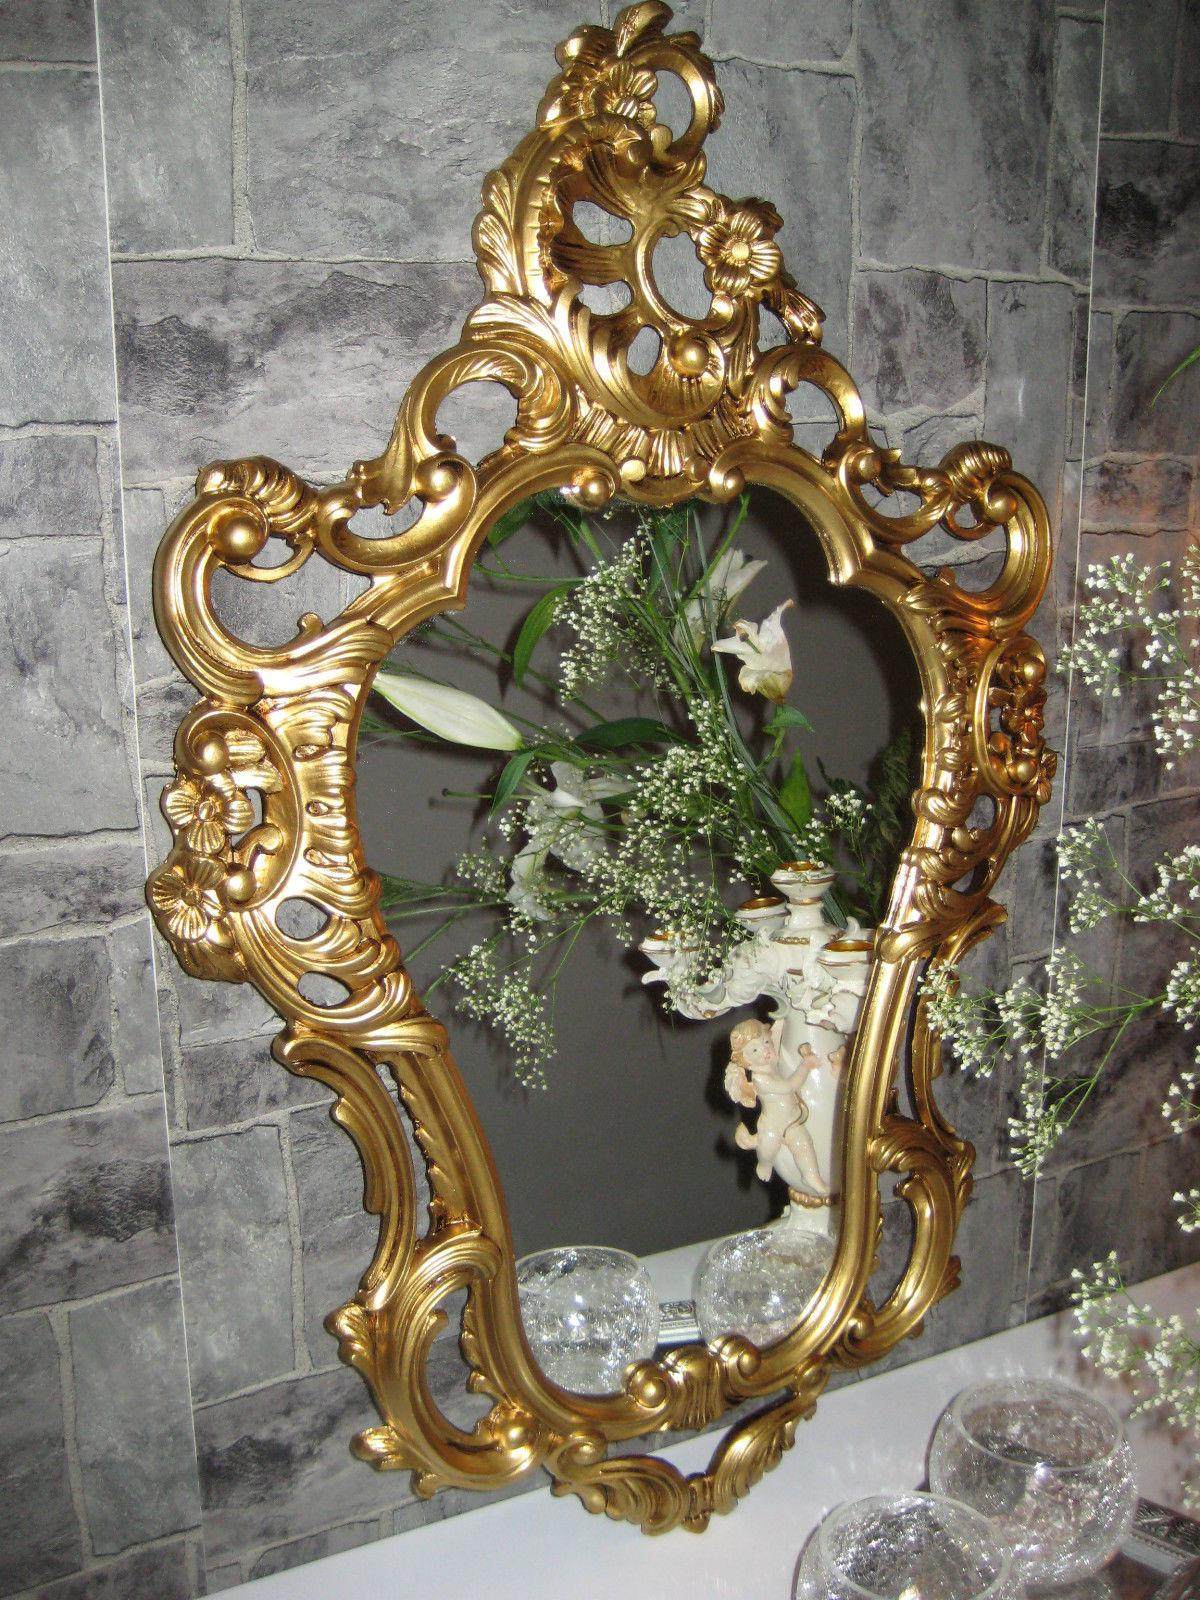 wandspiegel gold antik spiegel in jugendstil badspiegel barock 50x76 neu kaufen bei pintici. Black Bedroom Furniture Sets. Home Design Ideas